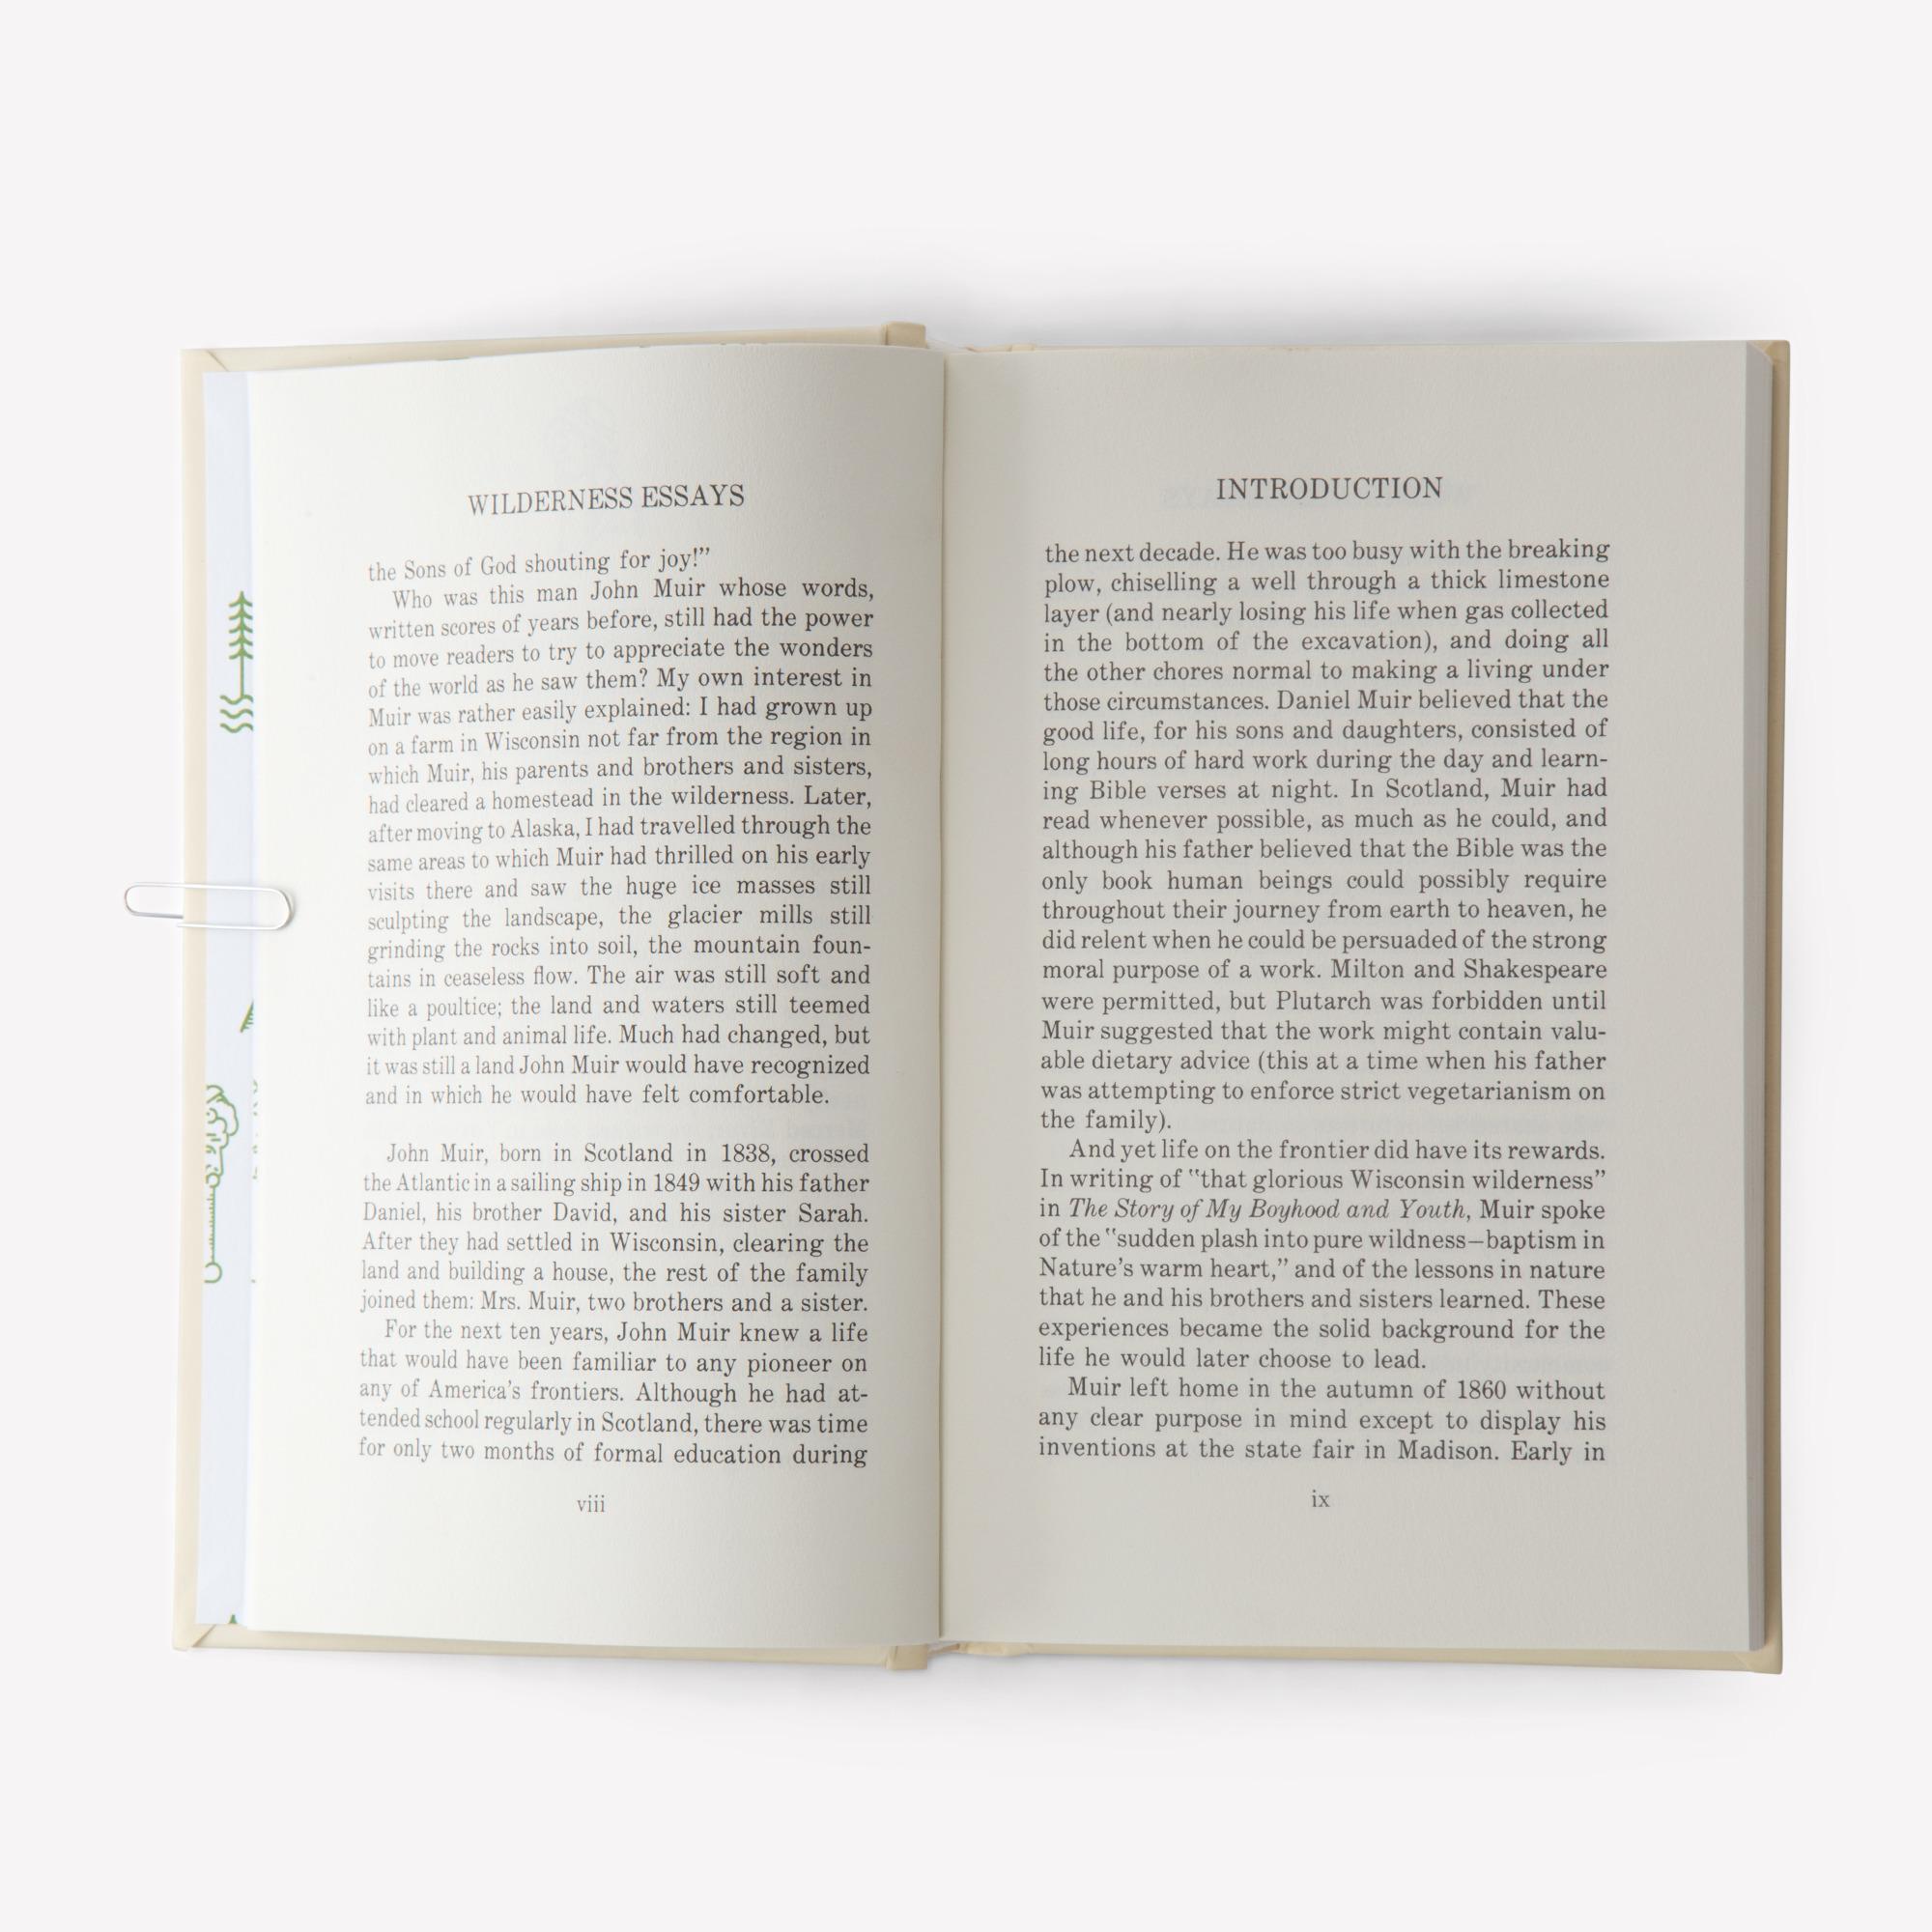 006 Gibbs Smith Wilderness Essays 220deleted201a279c83f634a891b615e39faad09a5bsha2bd0124165b81d12 Essay Example John Best Muir Pdf Review Full